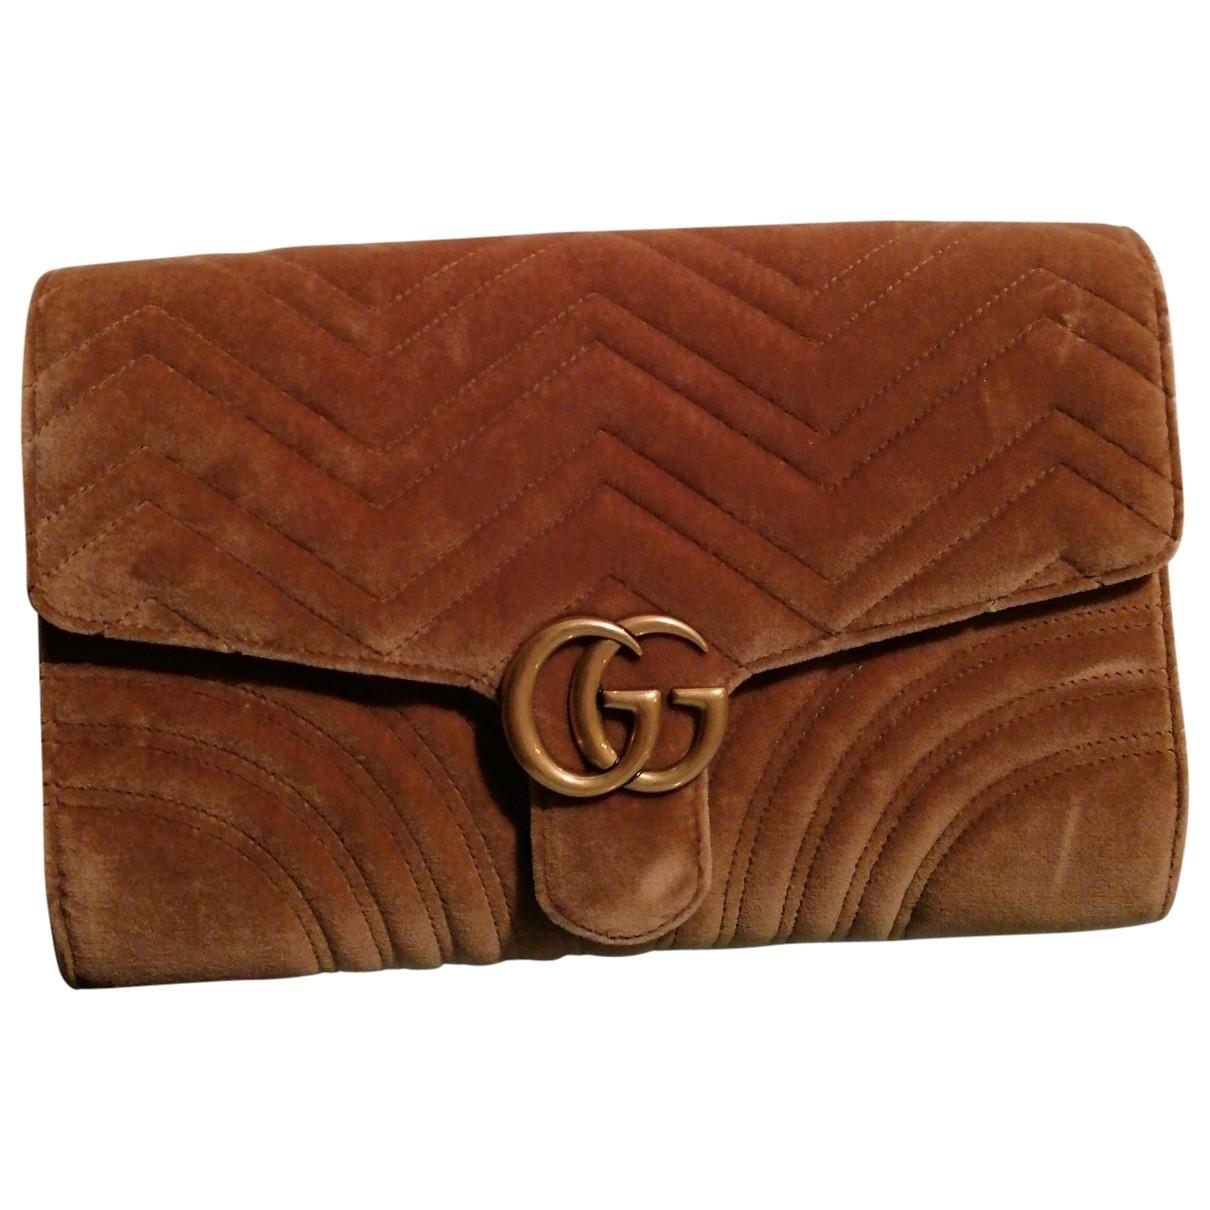 Gucci Marmont Beige Velvet Clutch bag for Women N